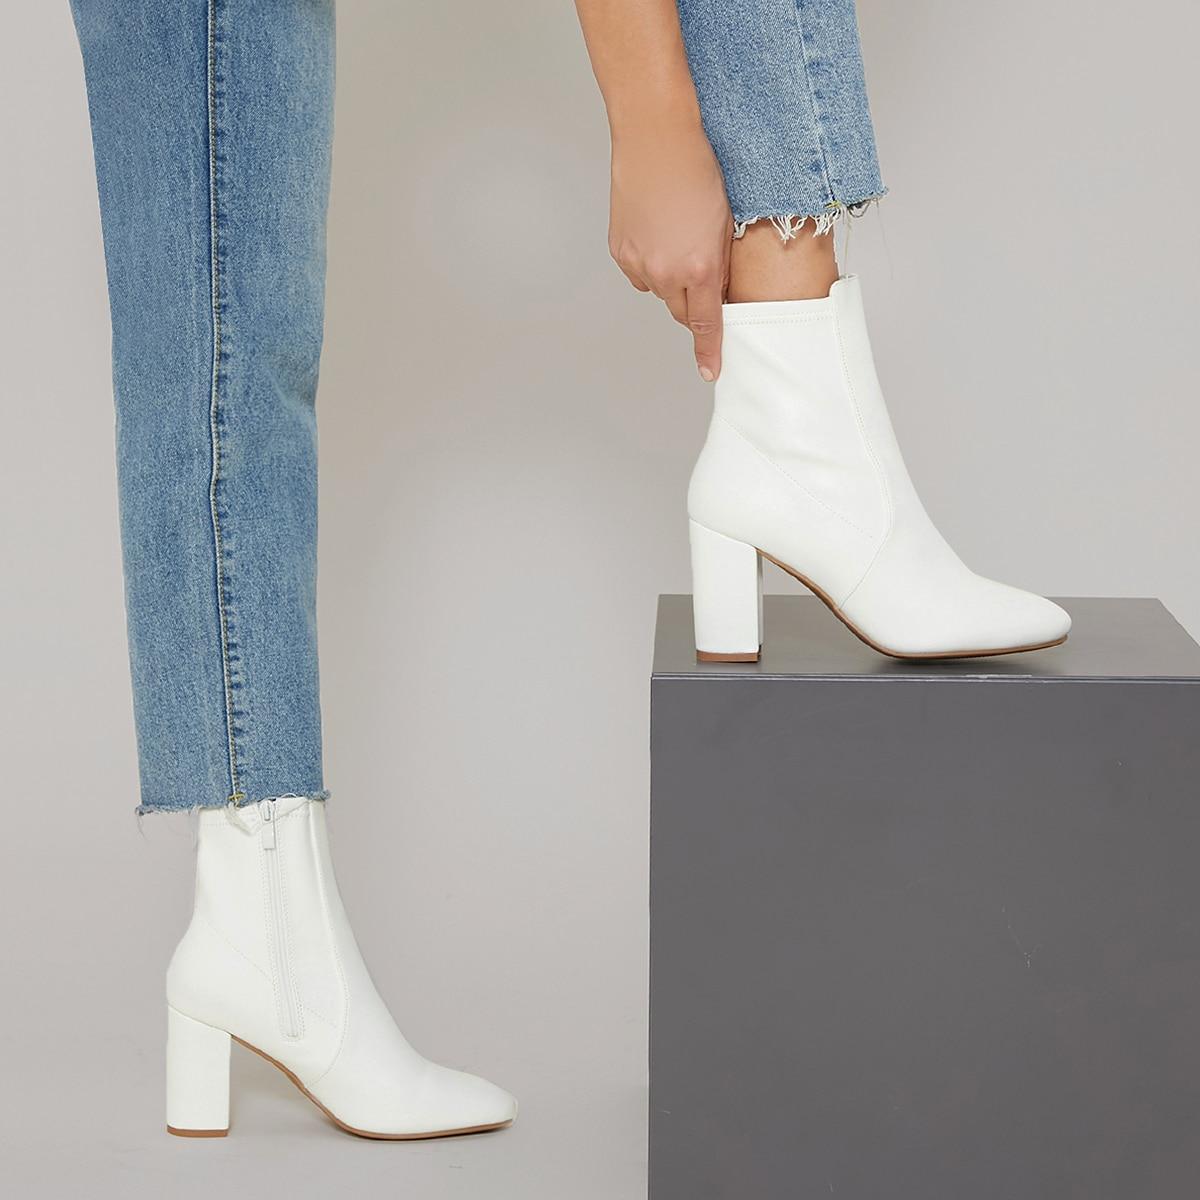 Vegan Leather High Block Heel Boots